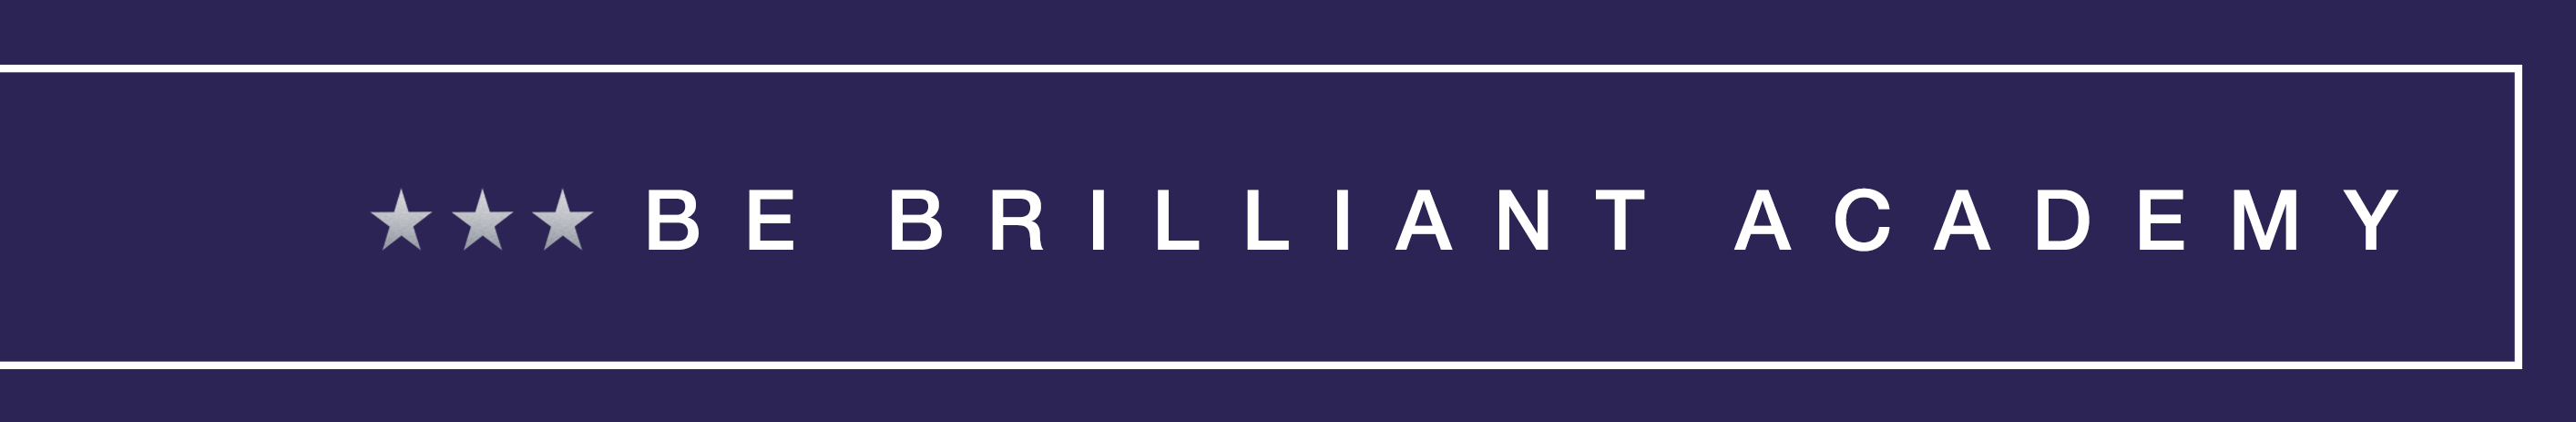 Be Brilliant Academy